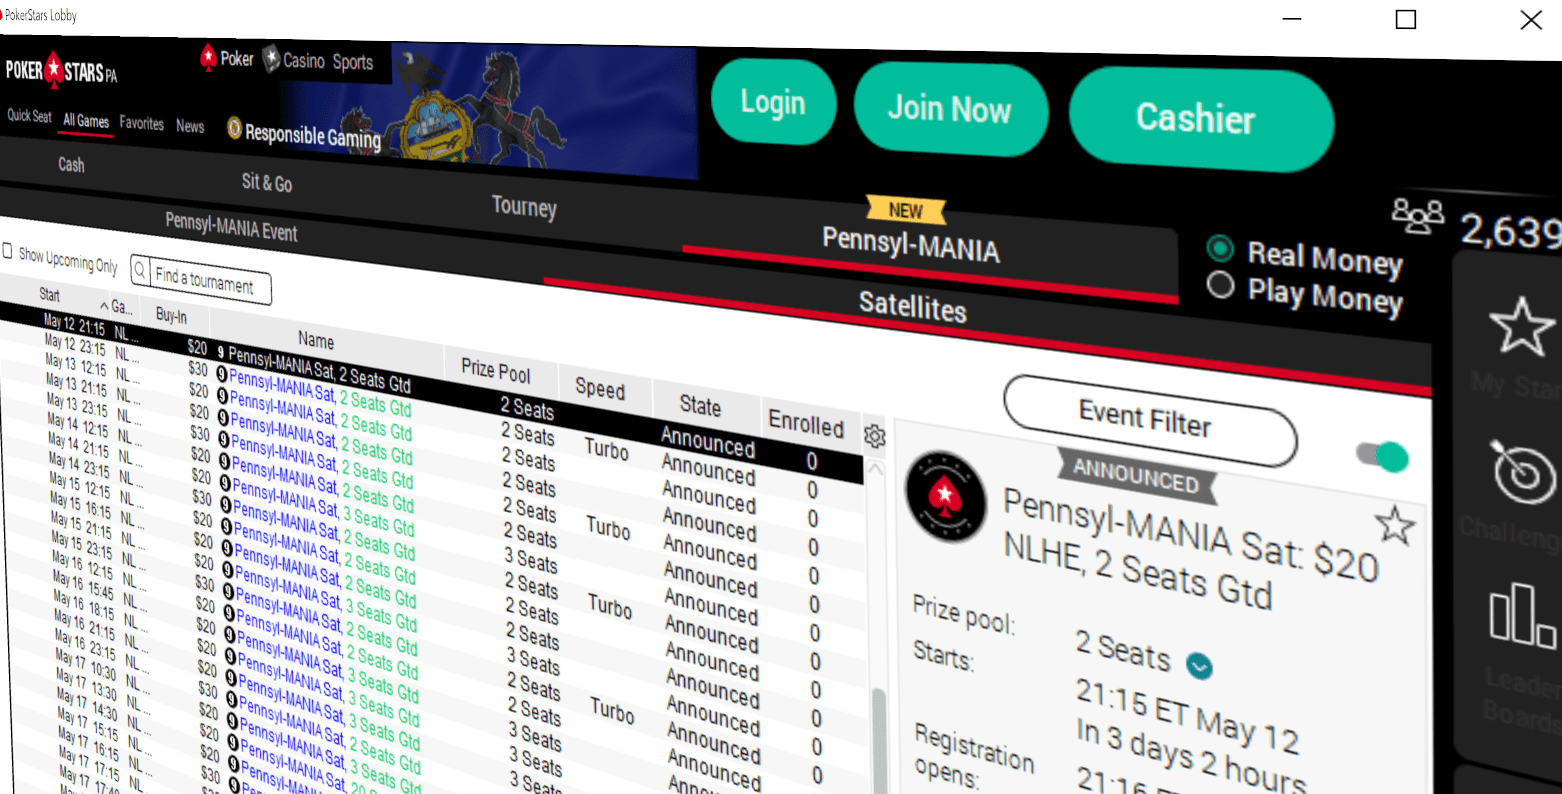 PA Online Poker - Pokerstars Lobby